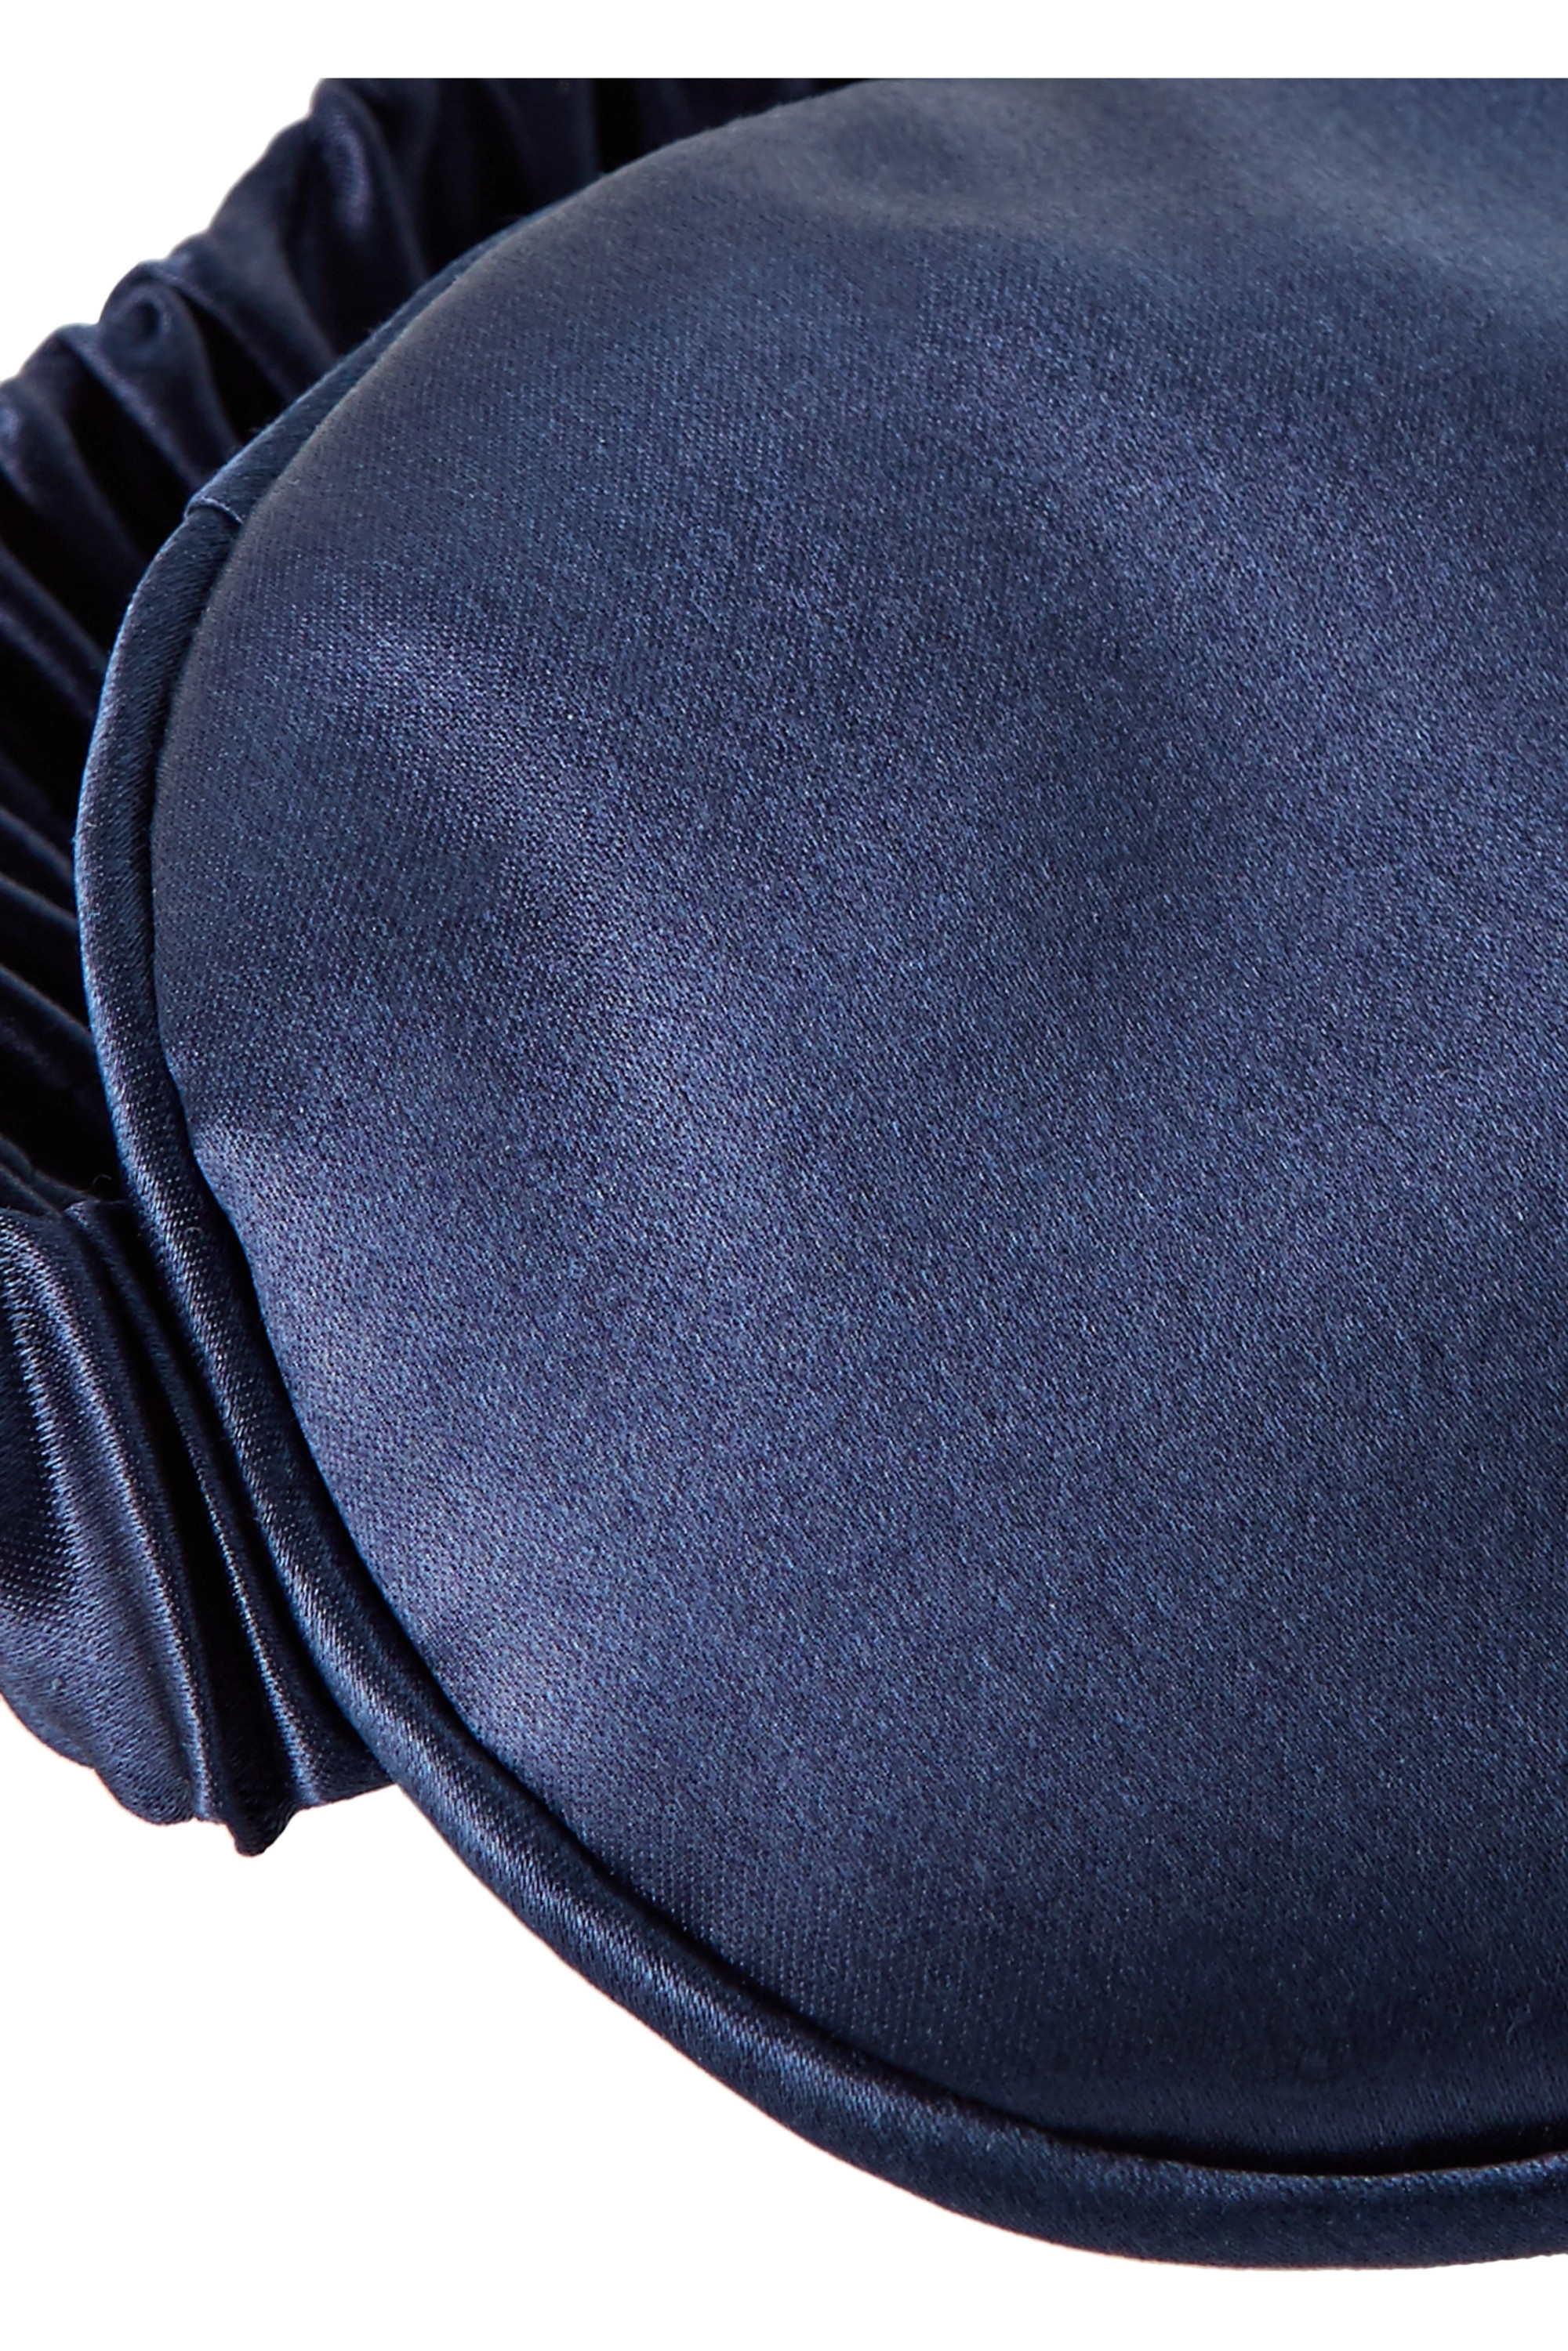 Slip Masque de sommeil en soie à broderies